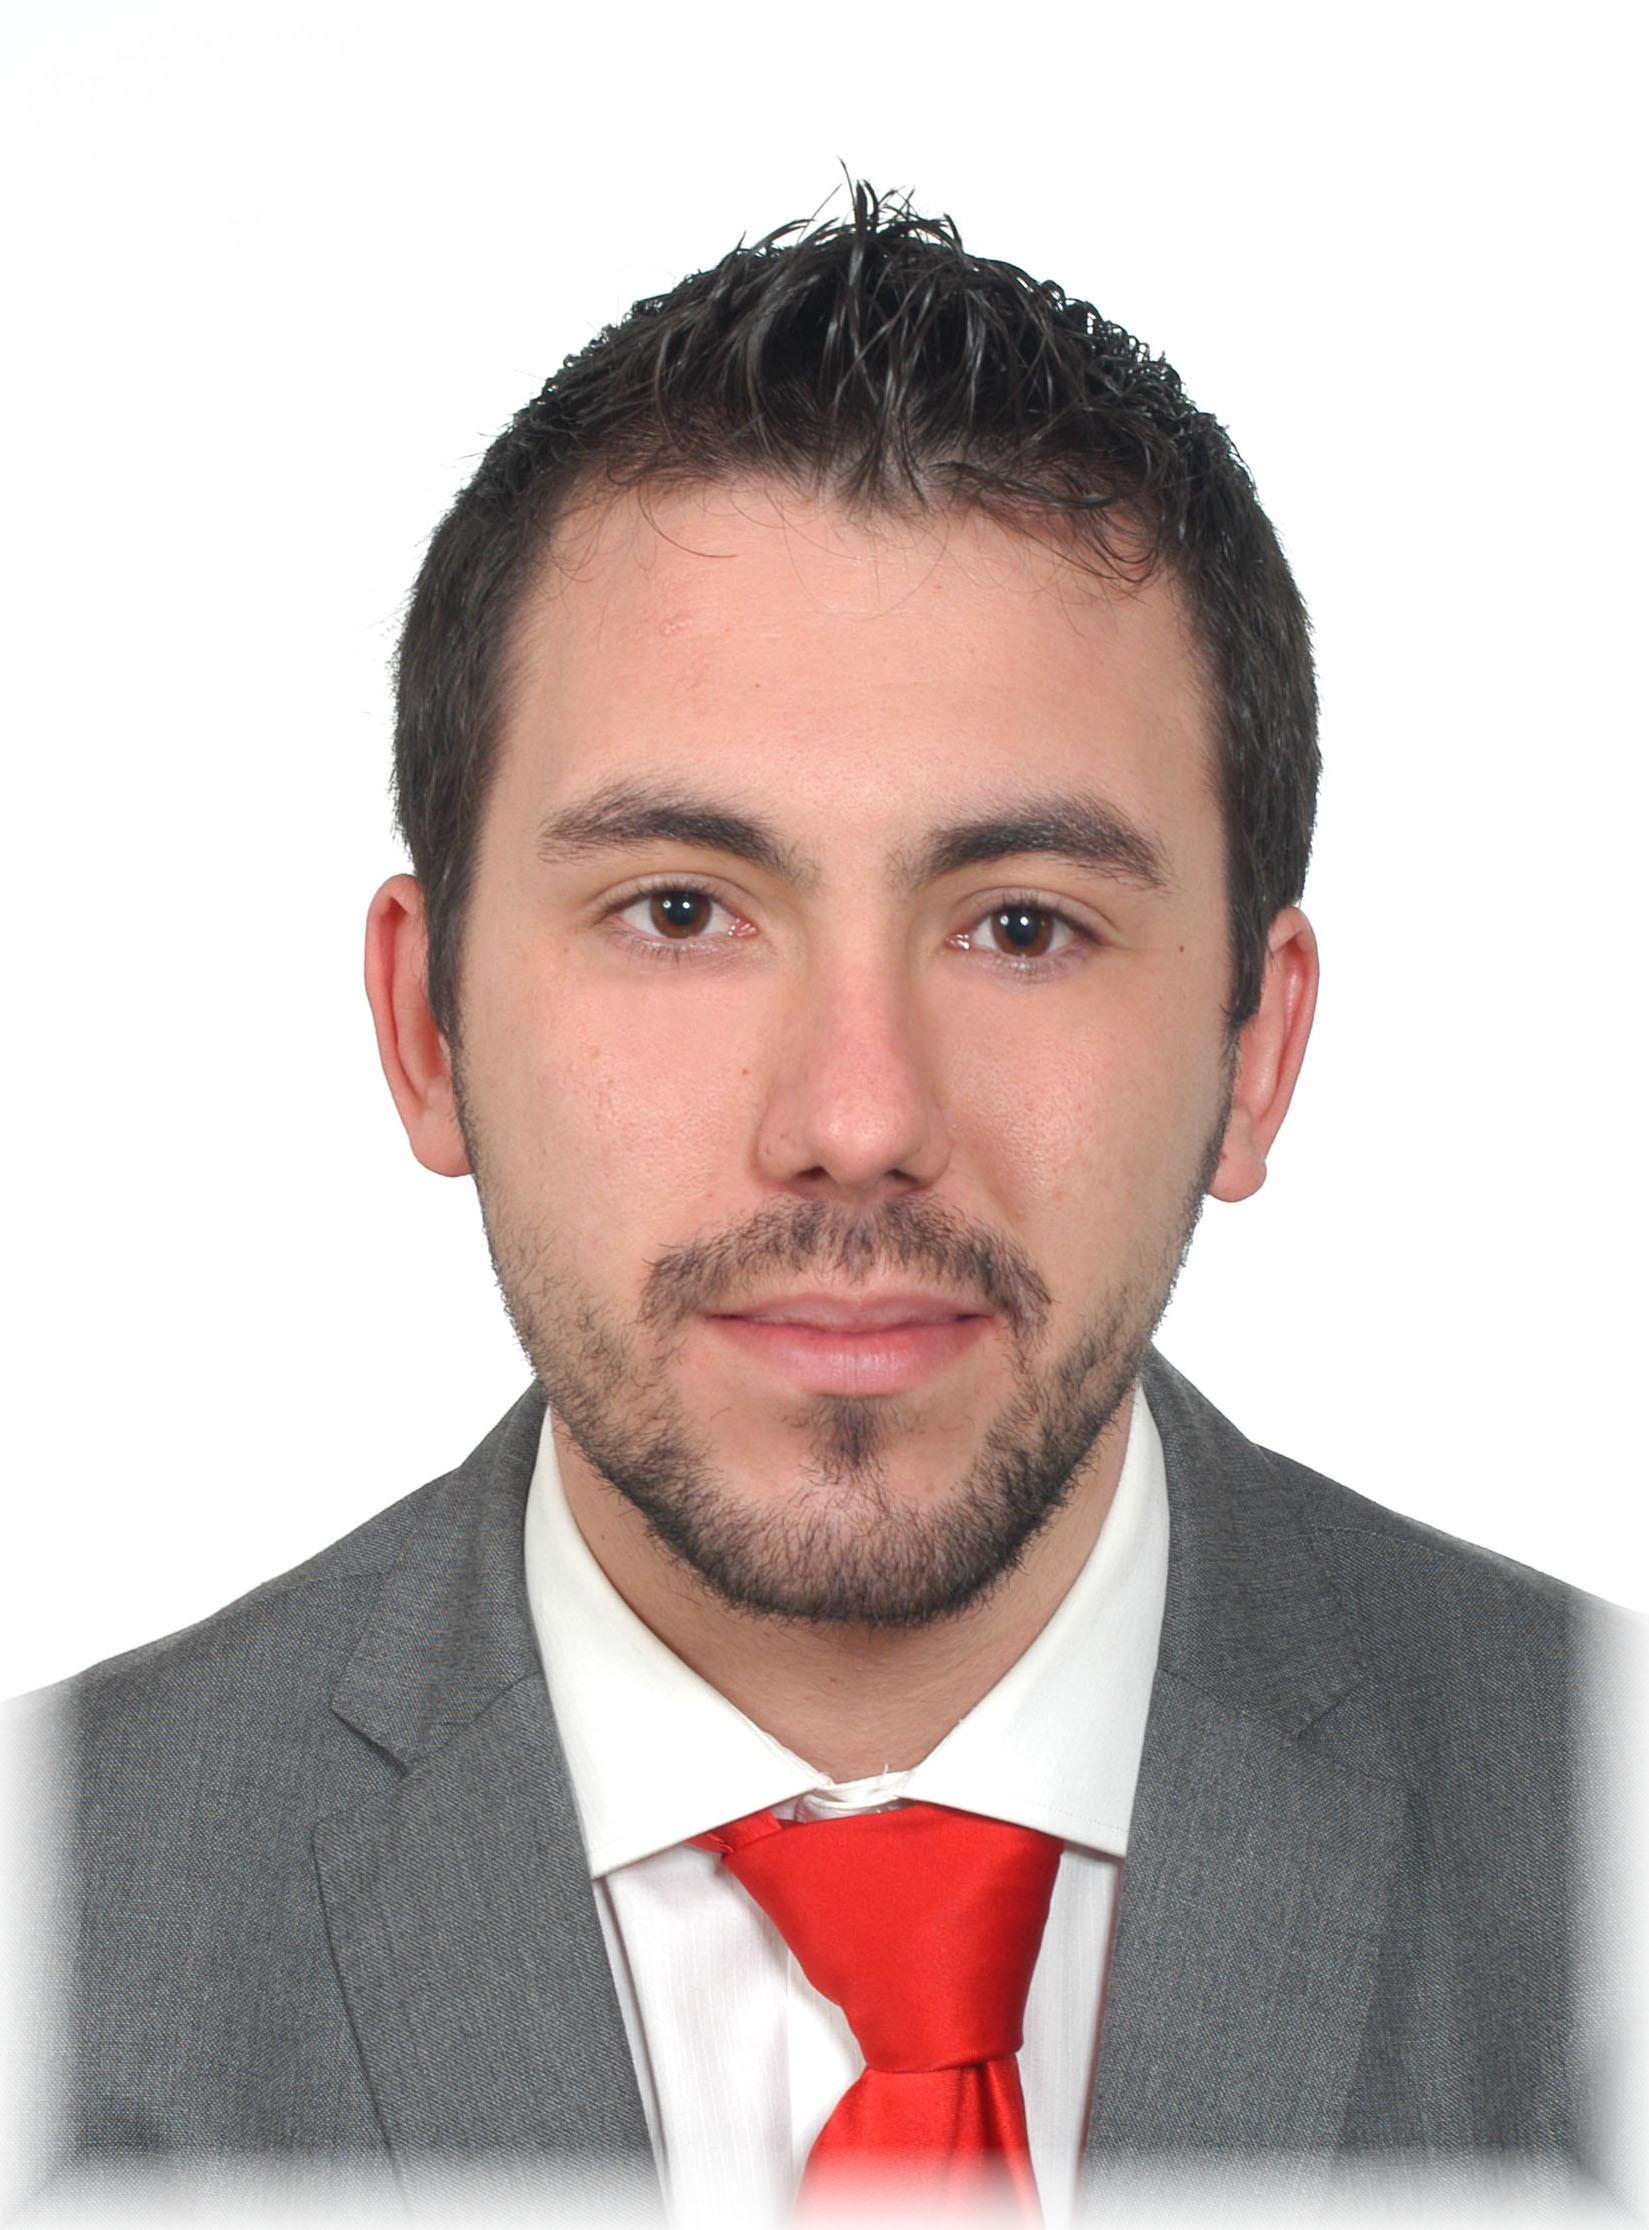 Raul Gallardo